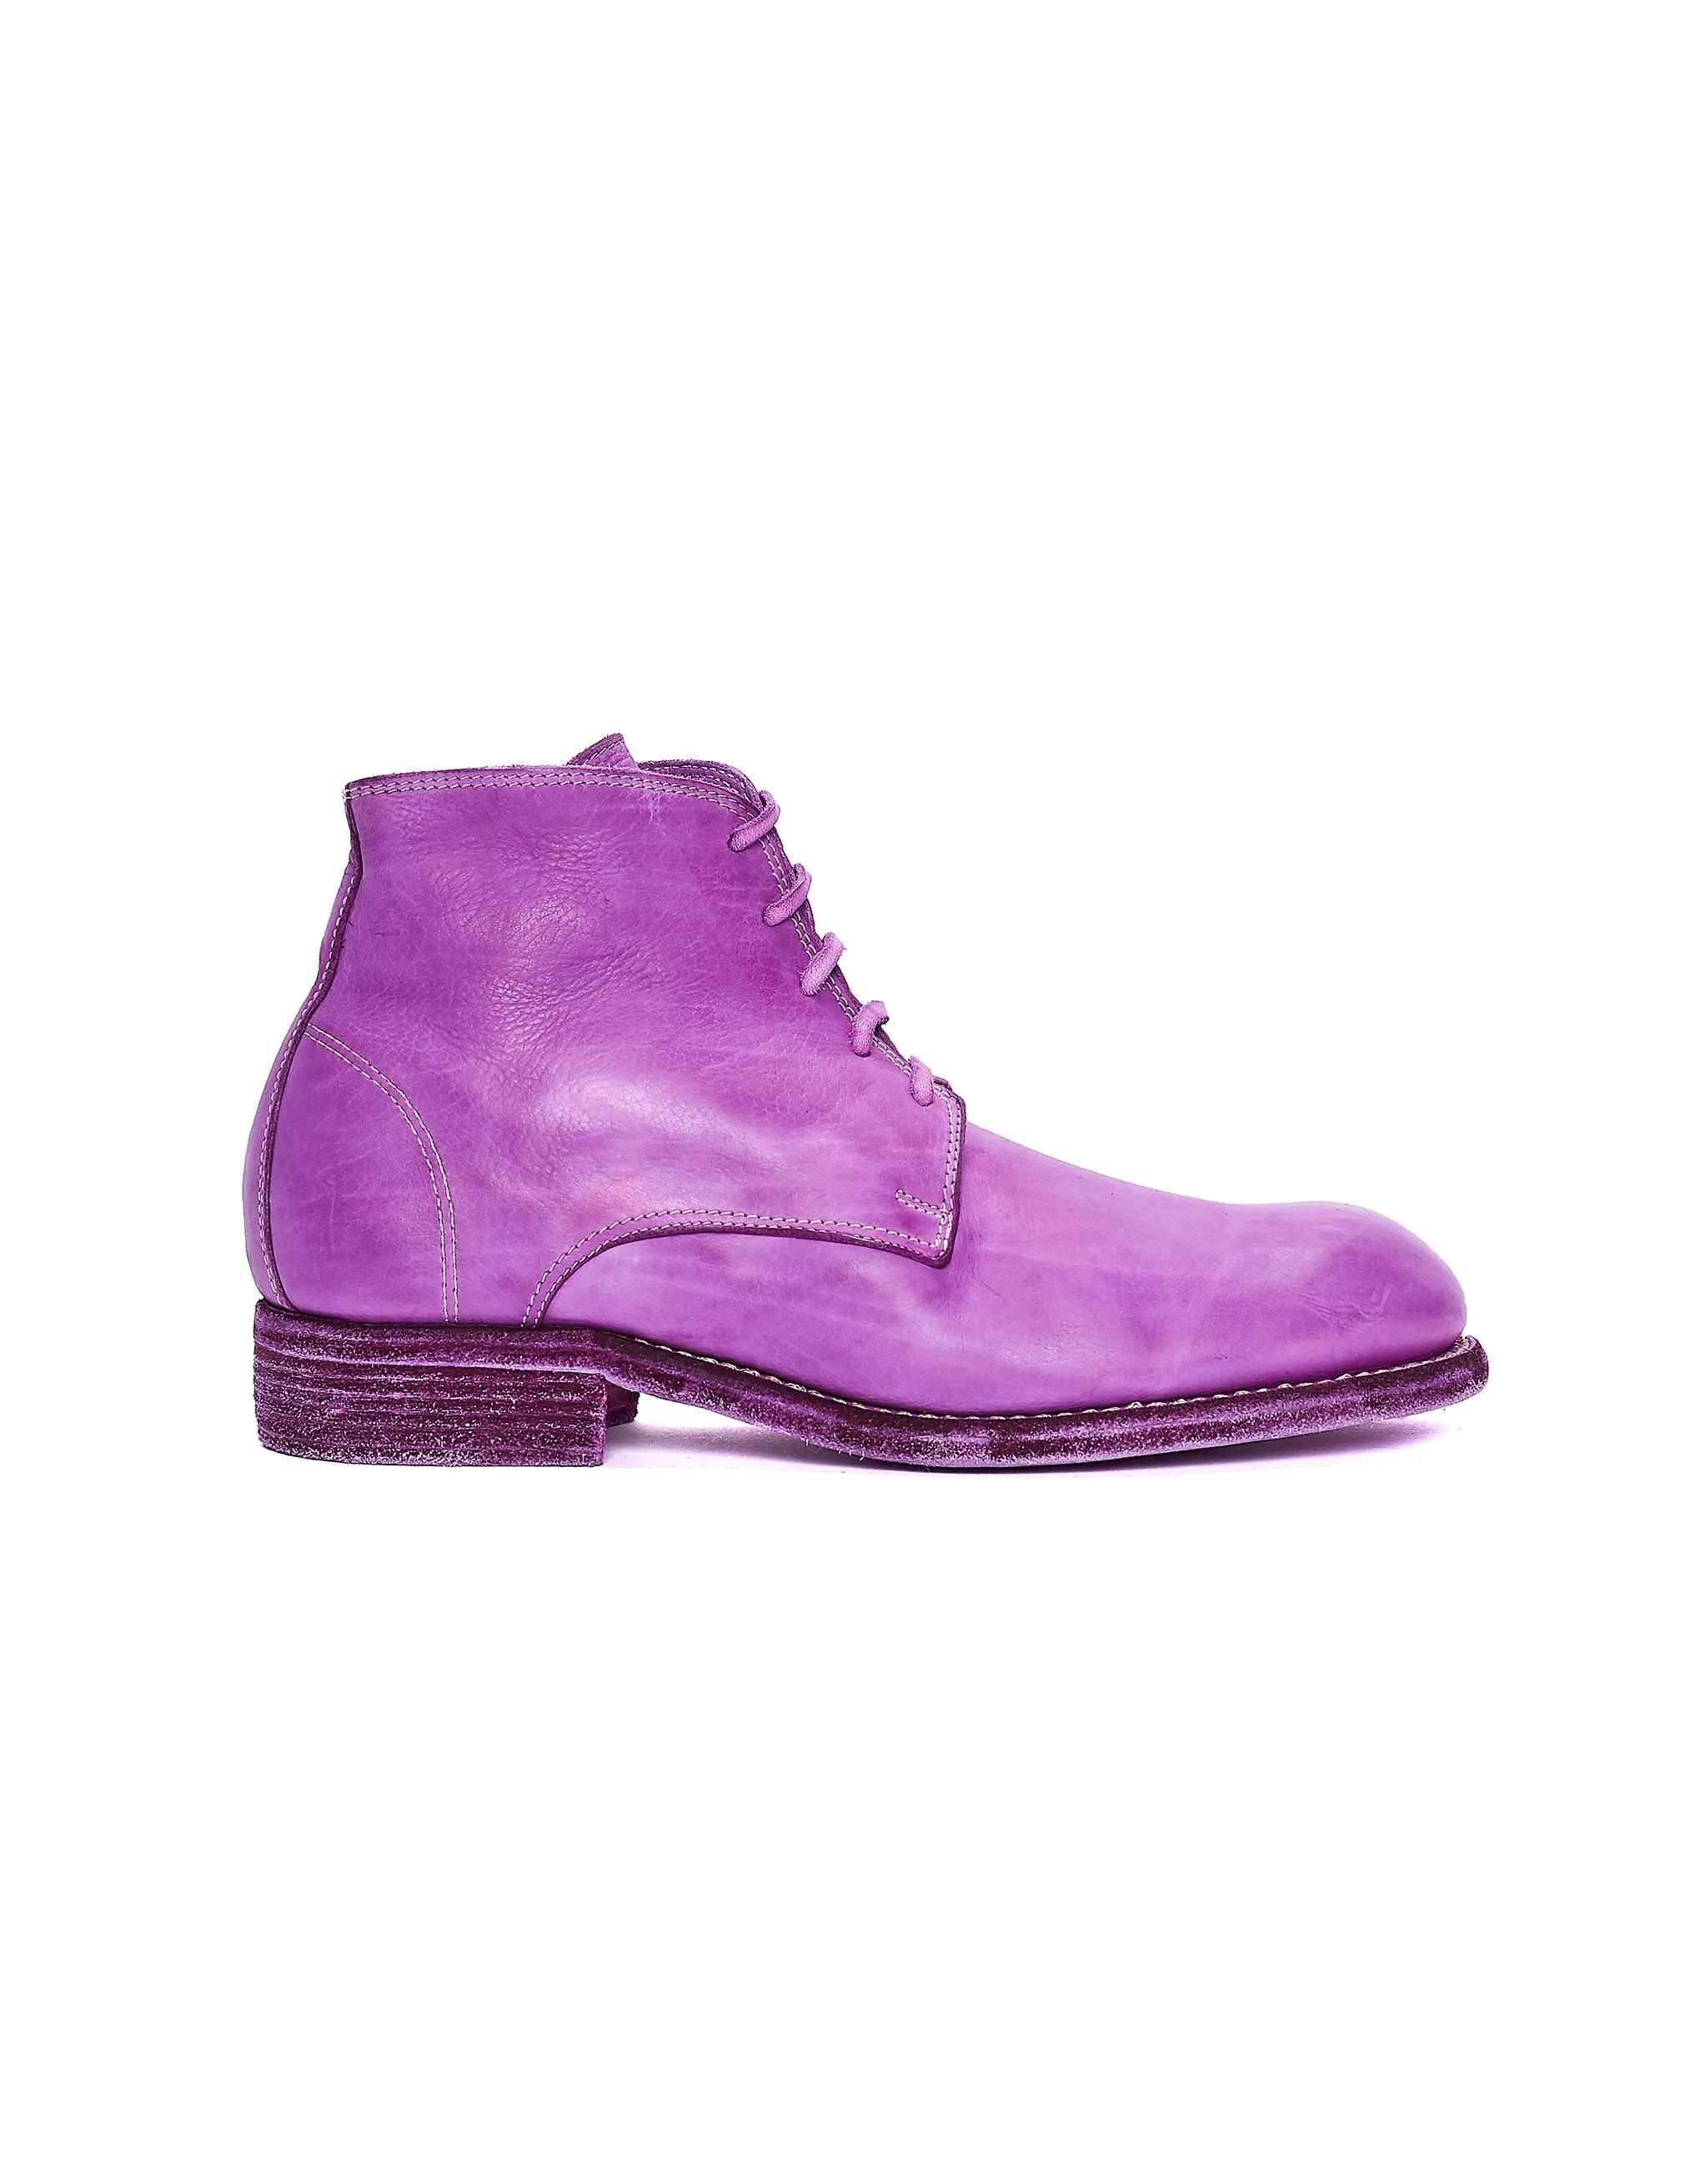 Guidi Purple Leather Boots